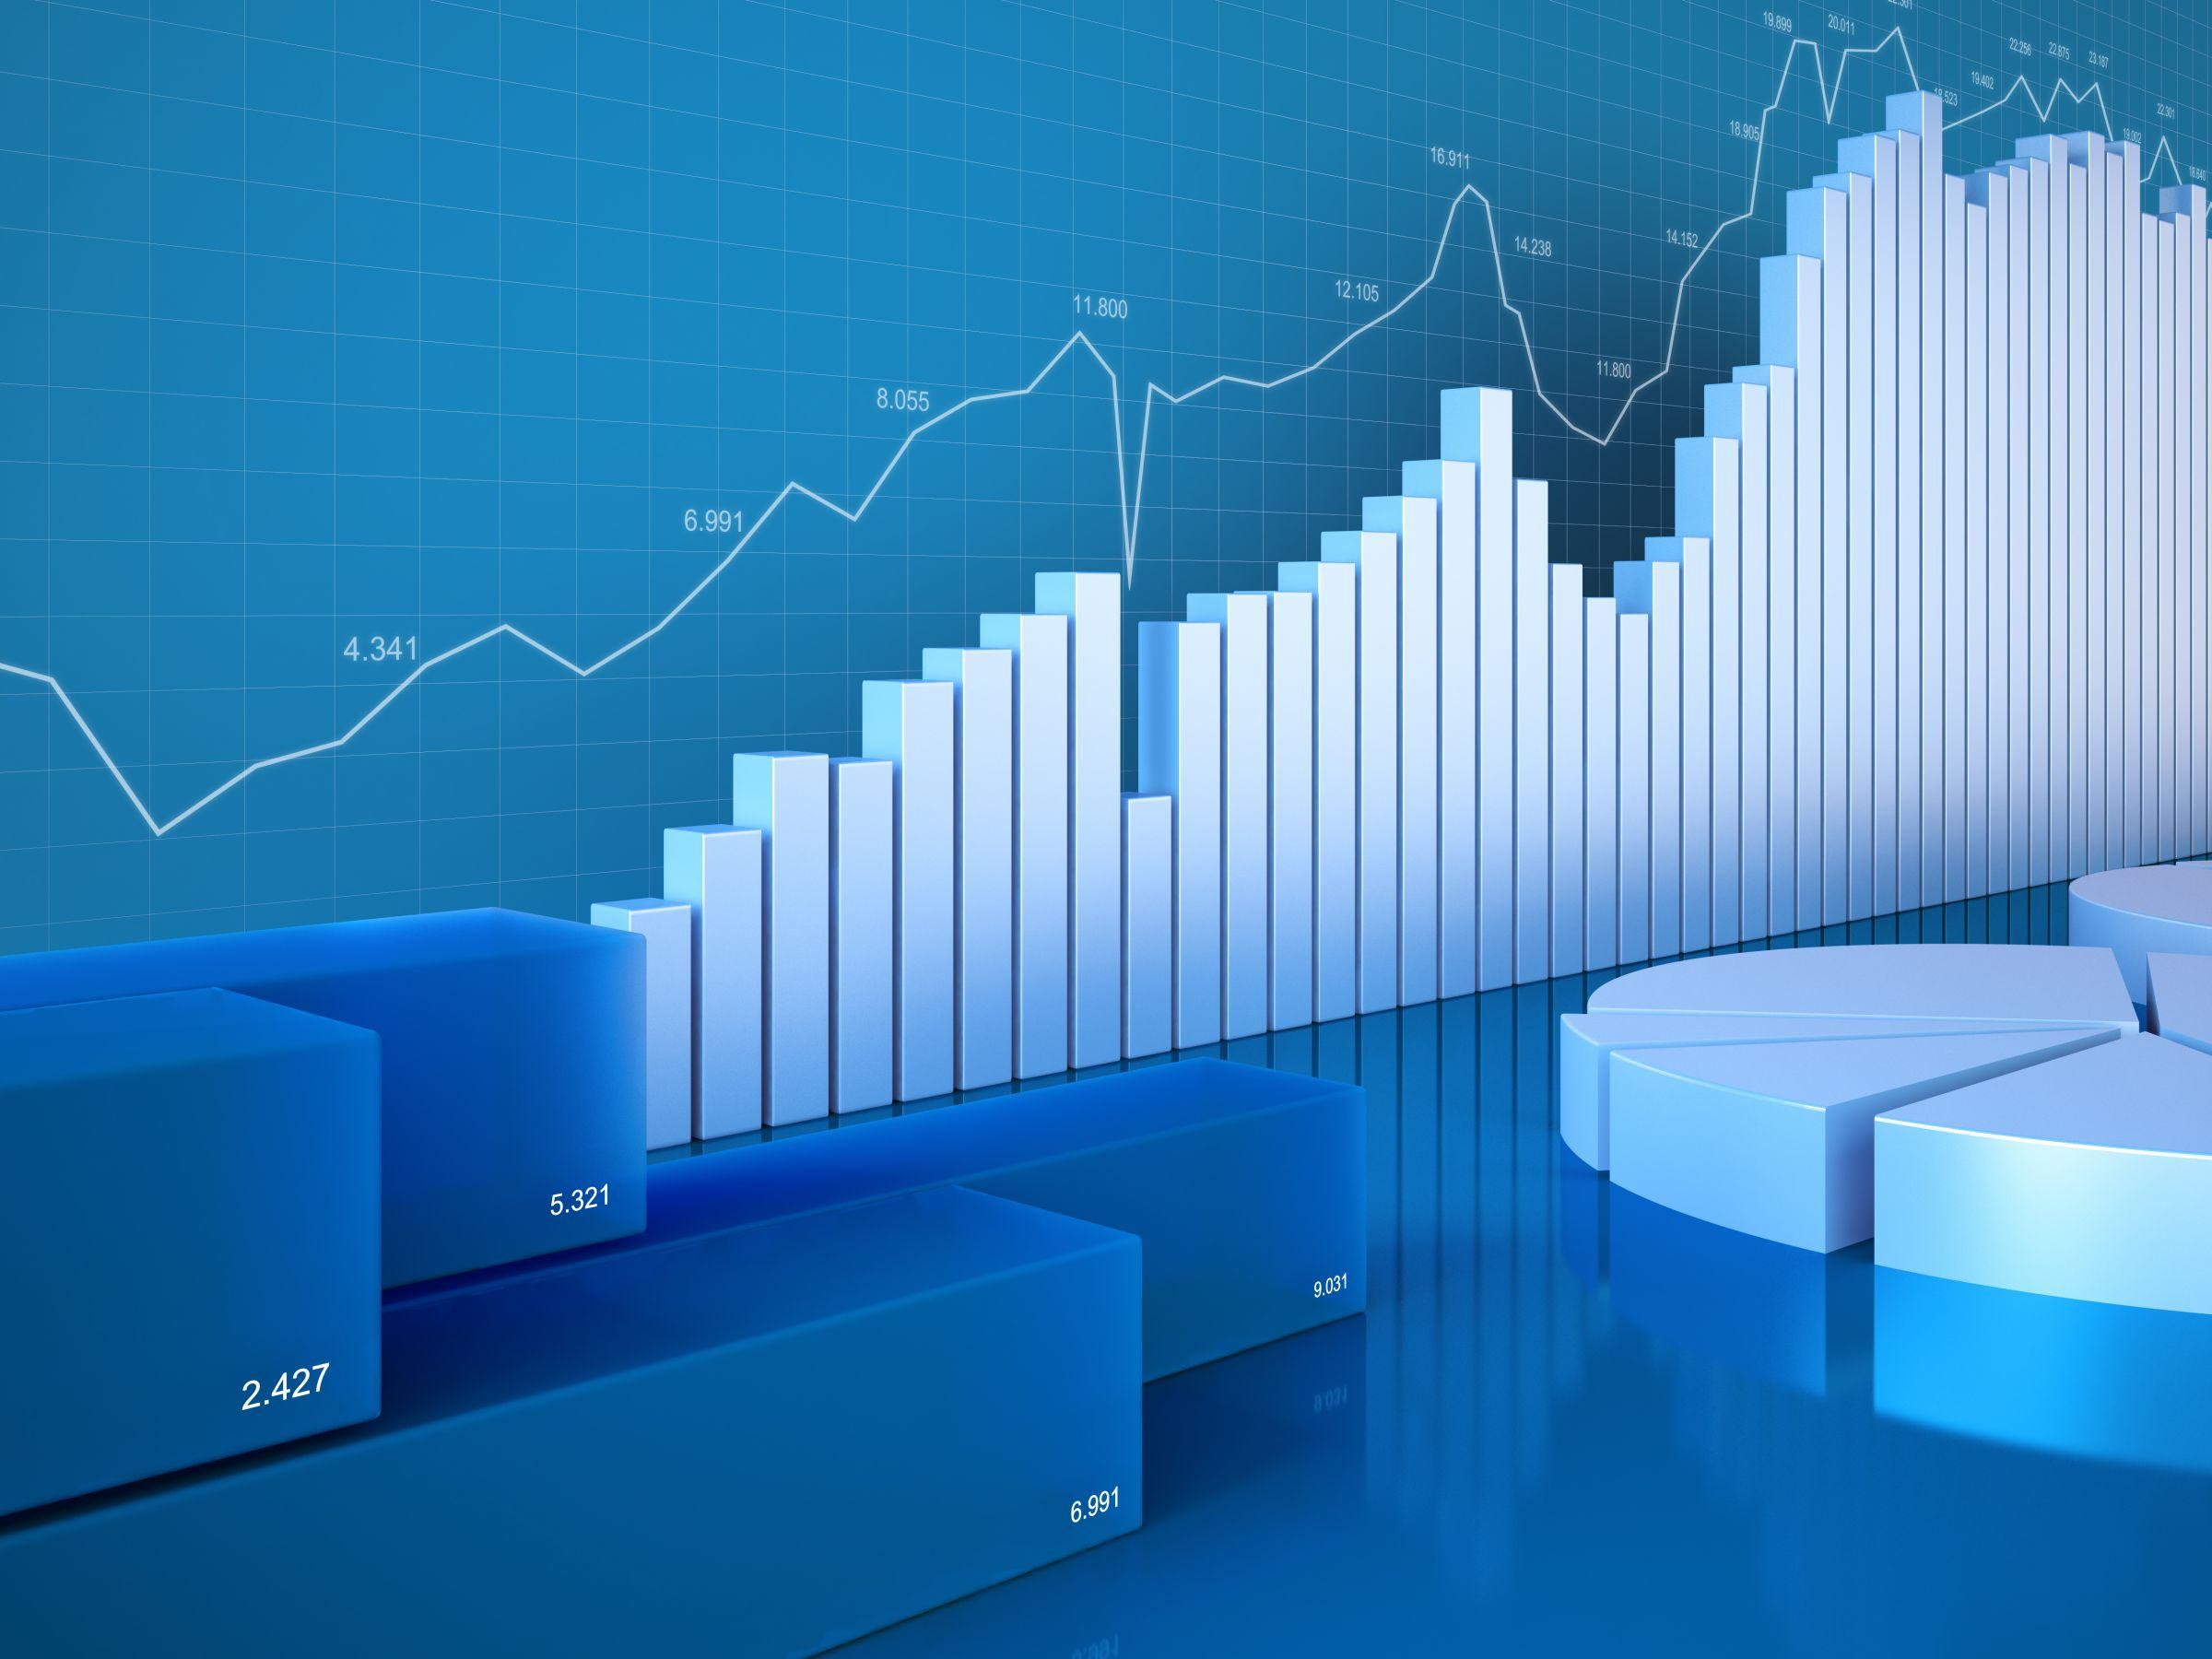 SEMR: Southeast Minnesota Realtors - Monthly Statistics